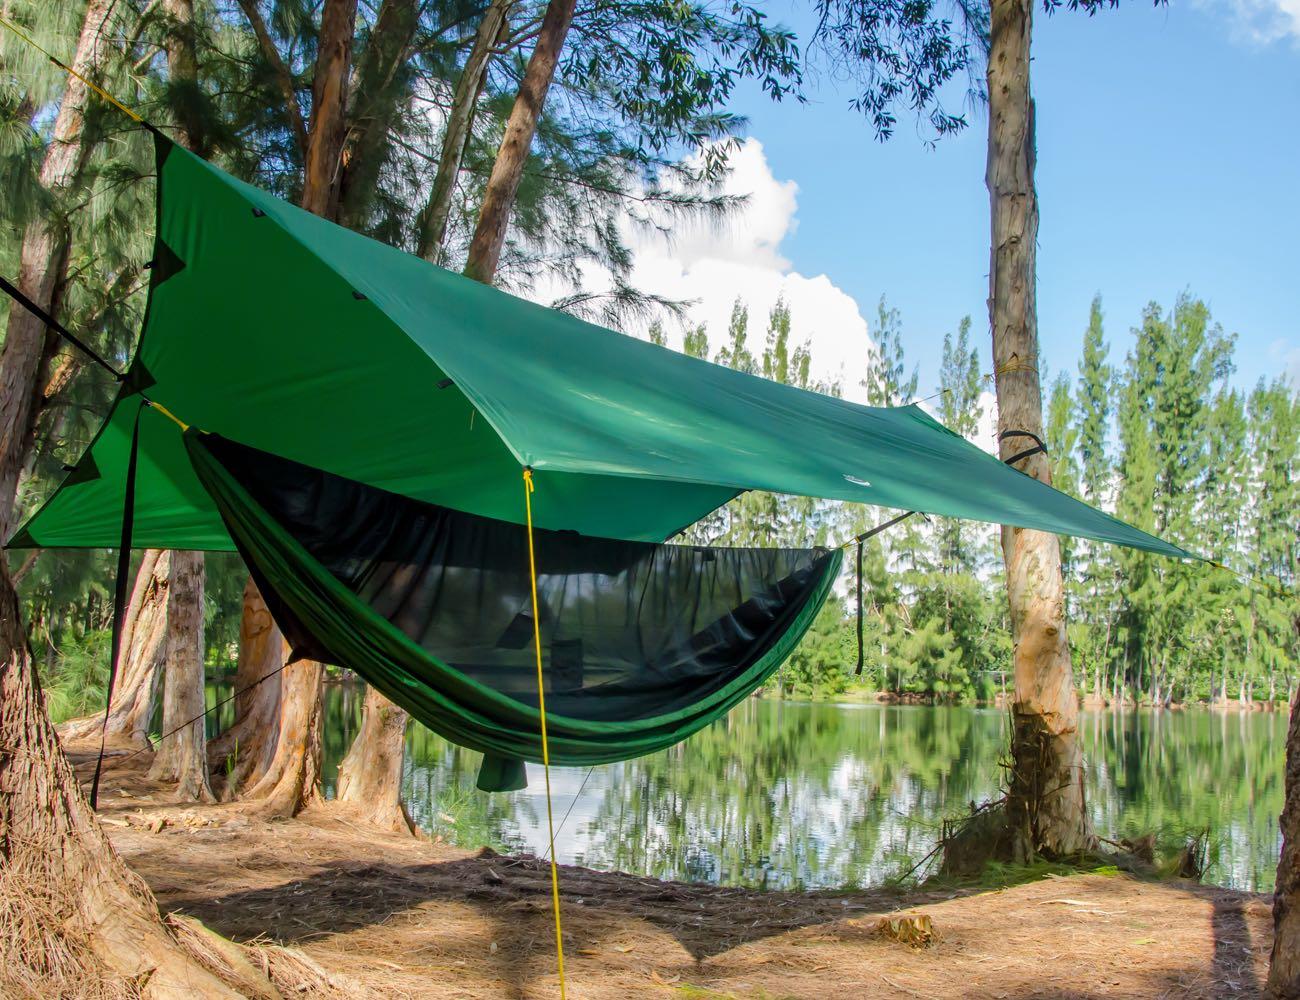 Enclosed Camping Hammocks